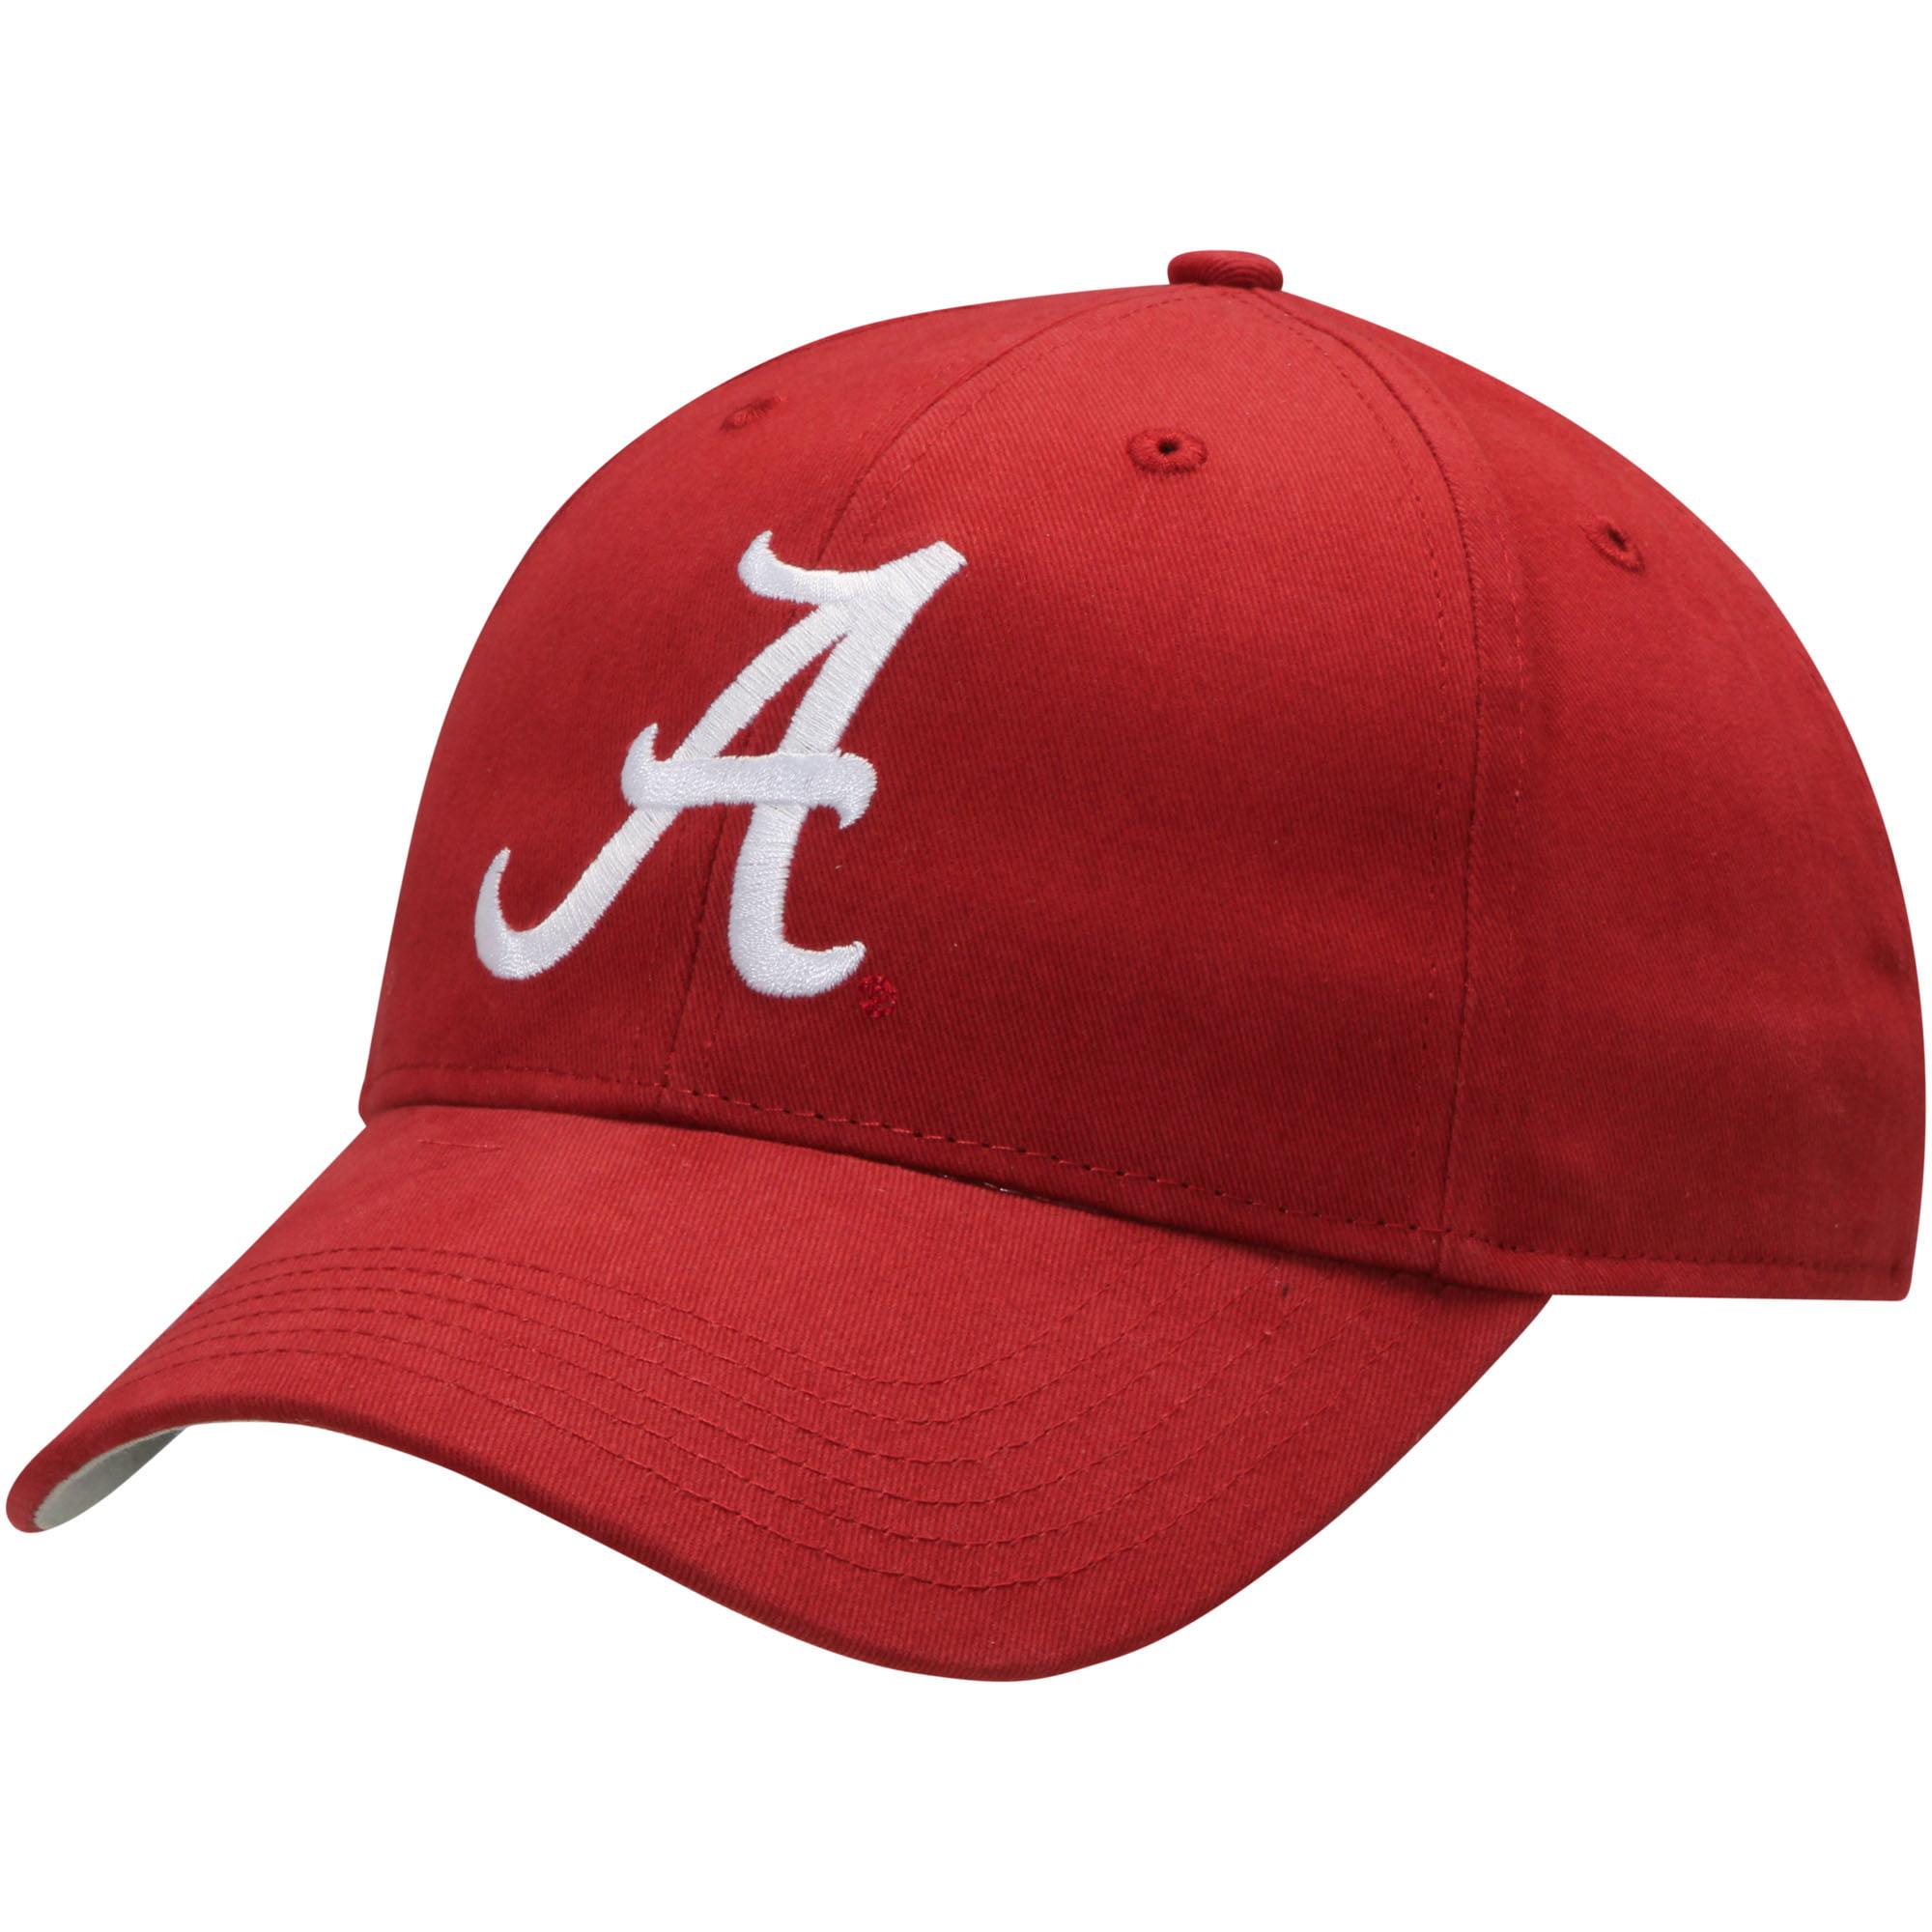 Men's Crimson Alabama Crimson Tide Team Logo Basic Adjustable Hat - OSFA